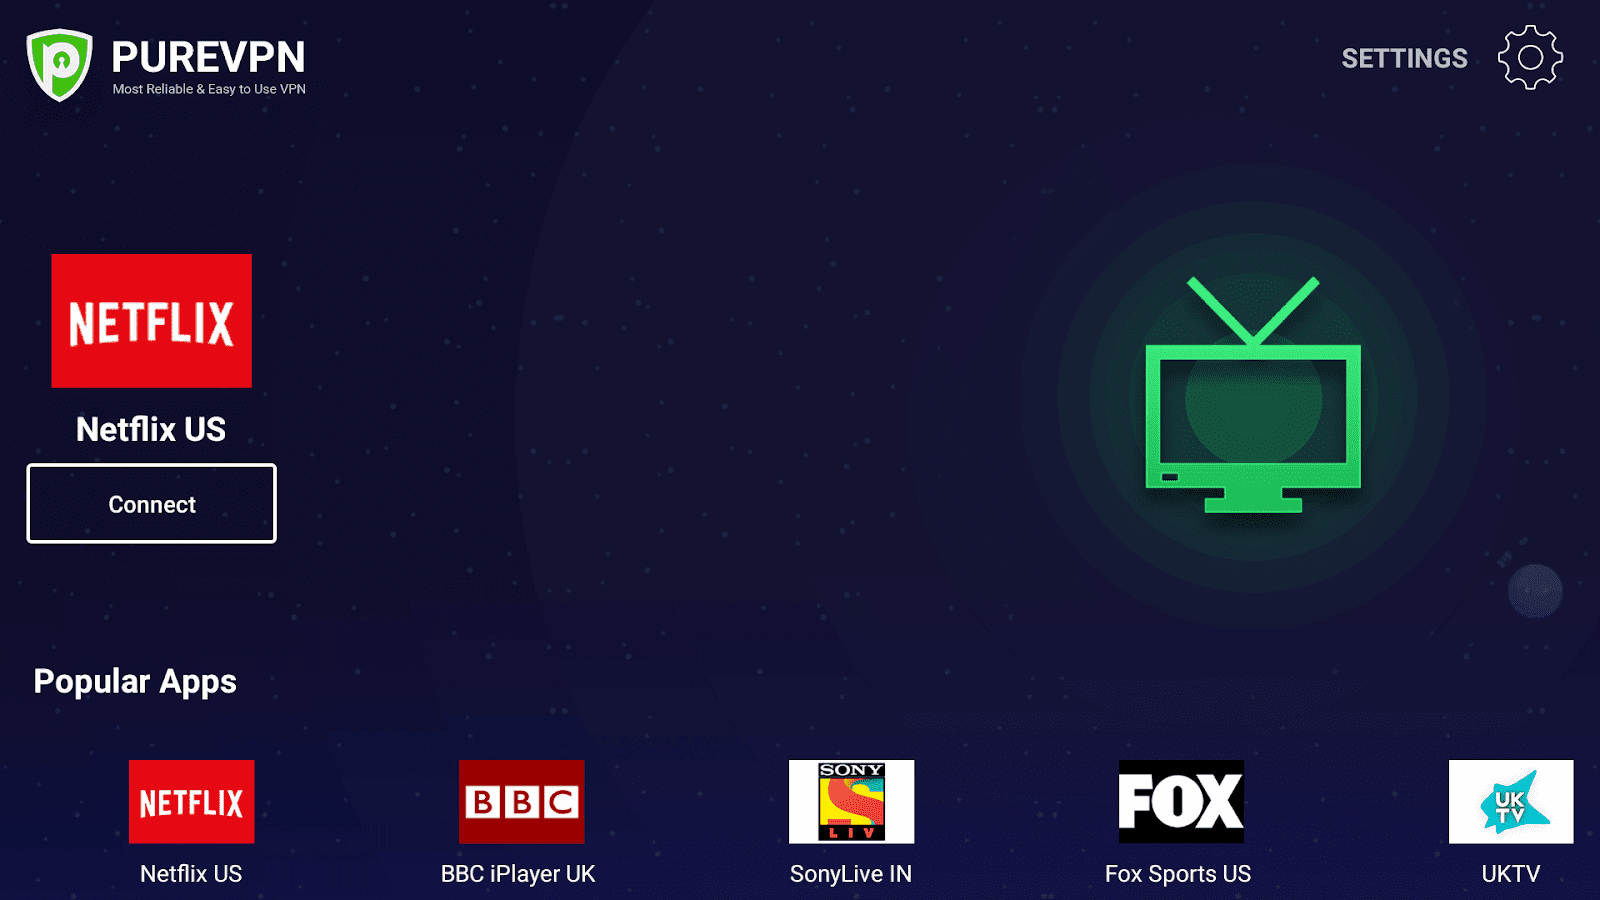 channel 1 B3Vs8Mfs DzTechs - كيفية مشاهدة محتويات Netflix و Disney+ للدول الأخرى باستخدام PureVPN